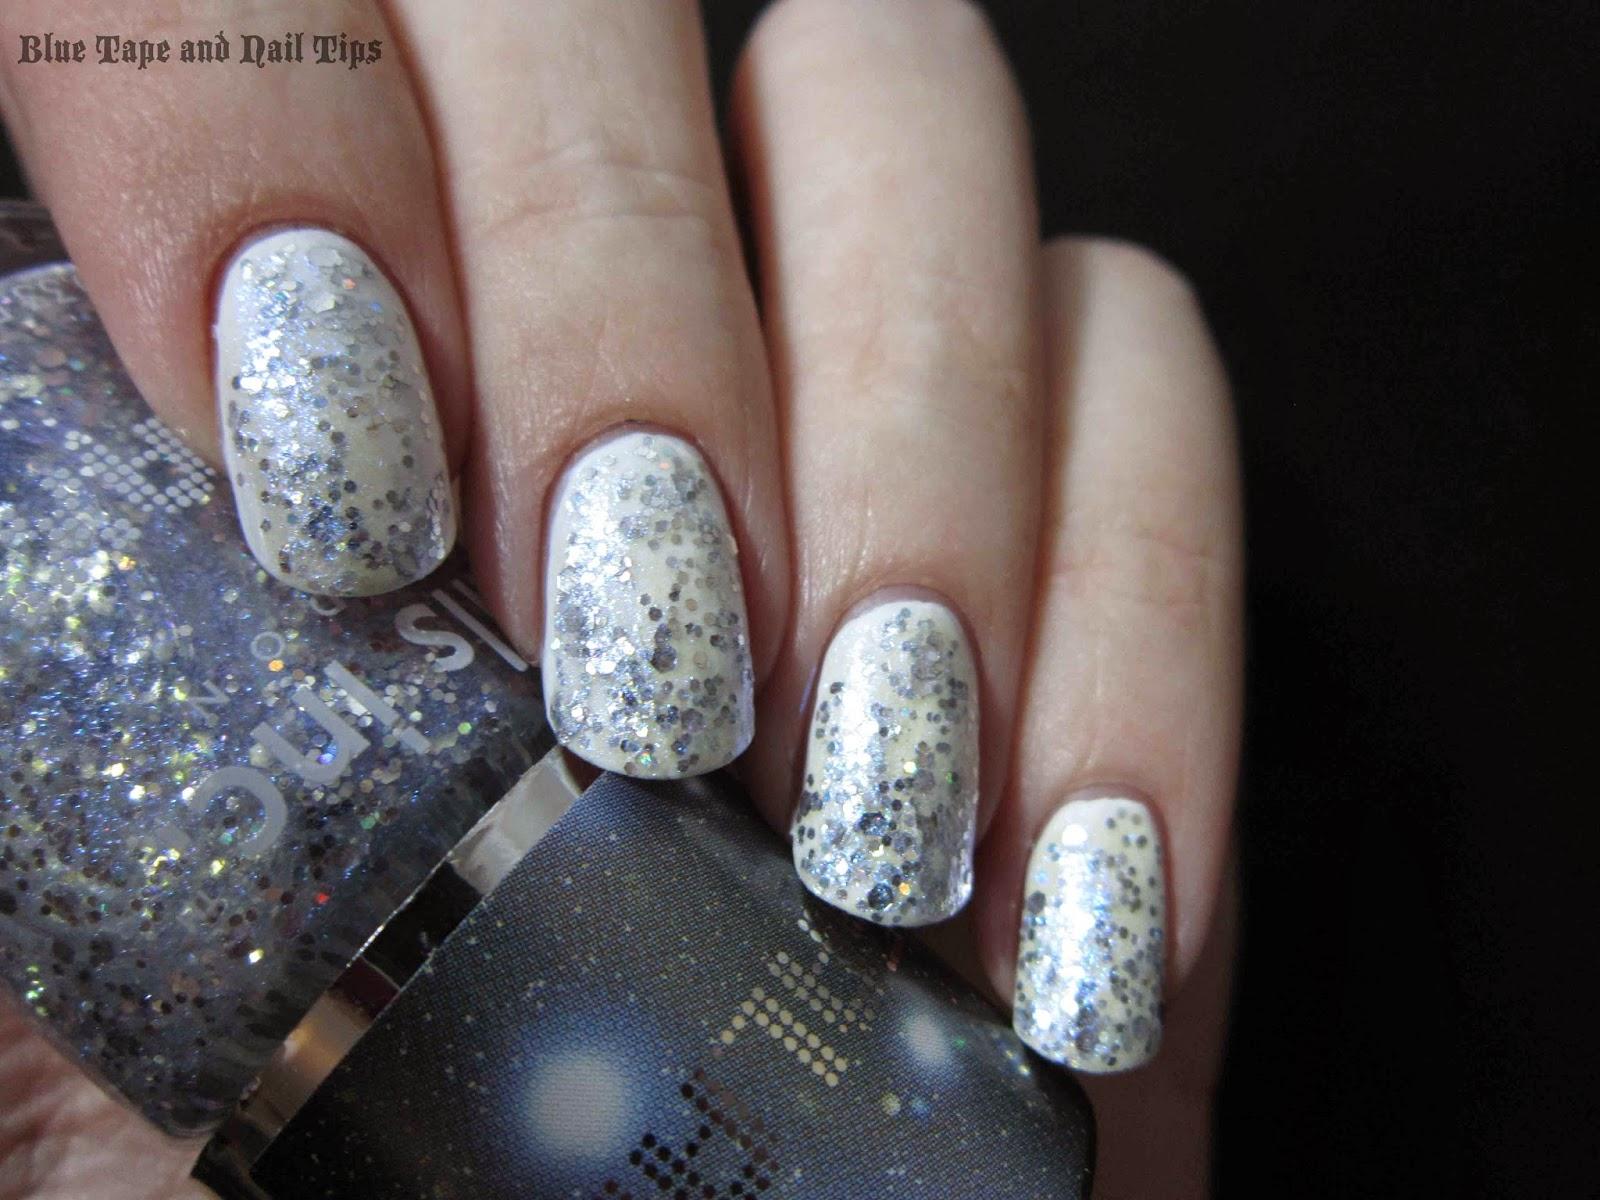 Blue Tape and Nail Tips: Nails Inc Galaxy in Trafalgar Crescent